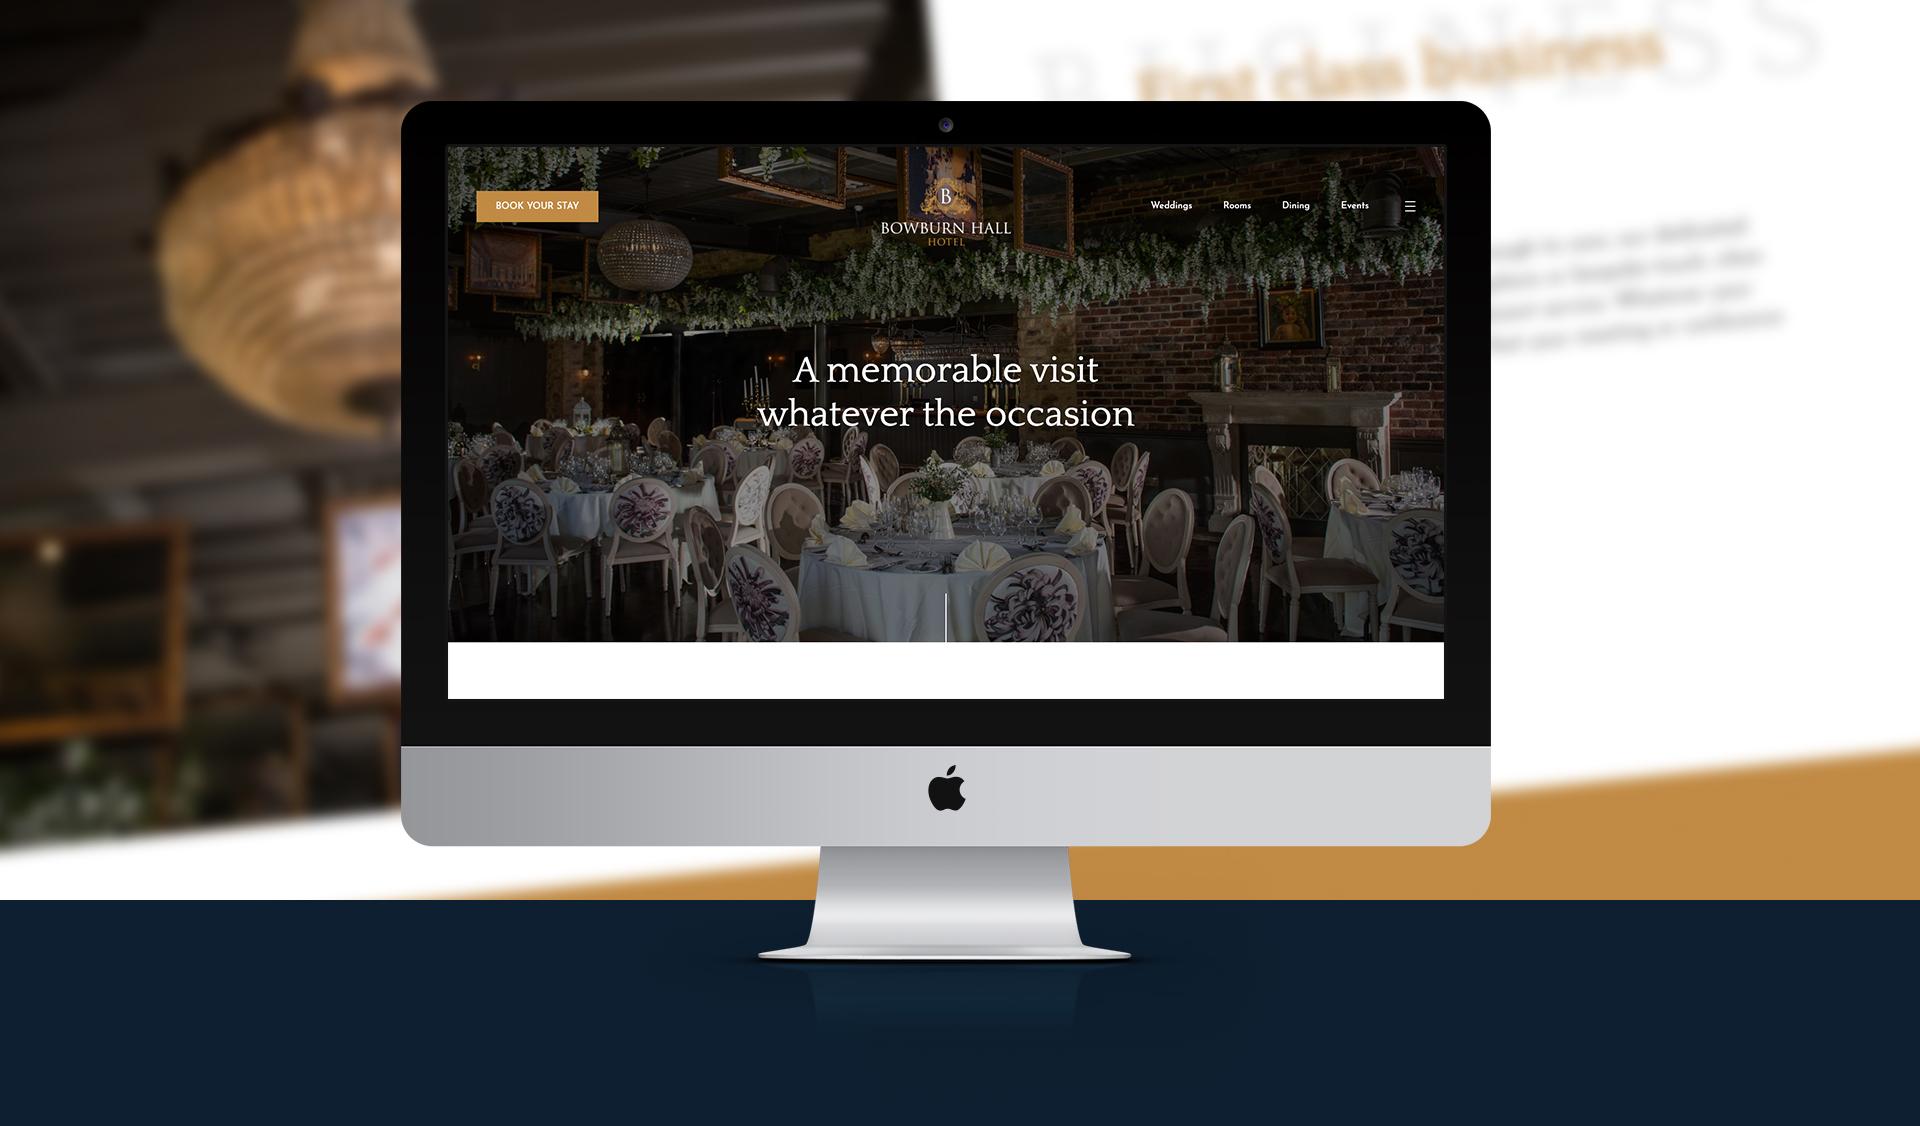 bowburn-hall-hotel-imac-website-case-study